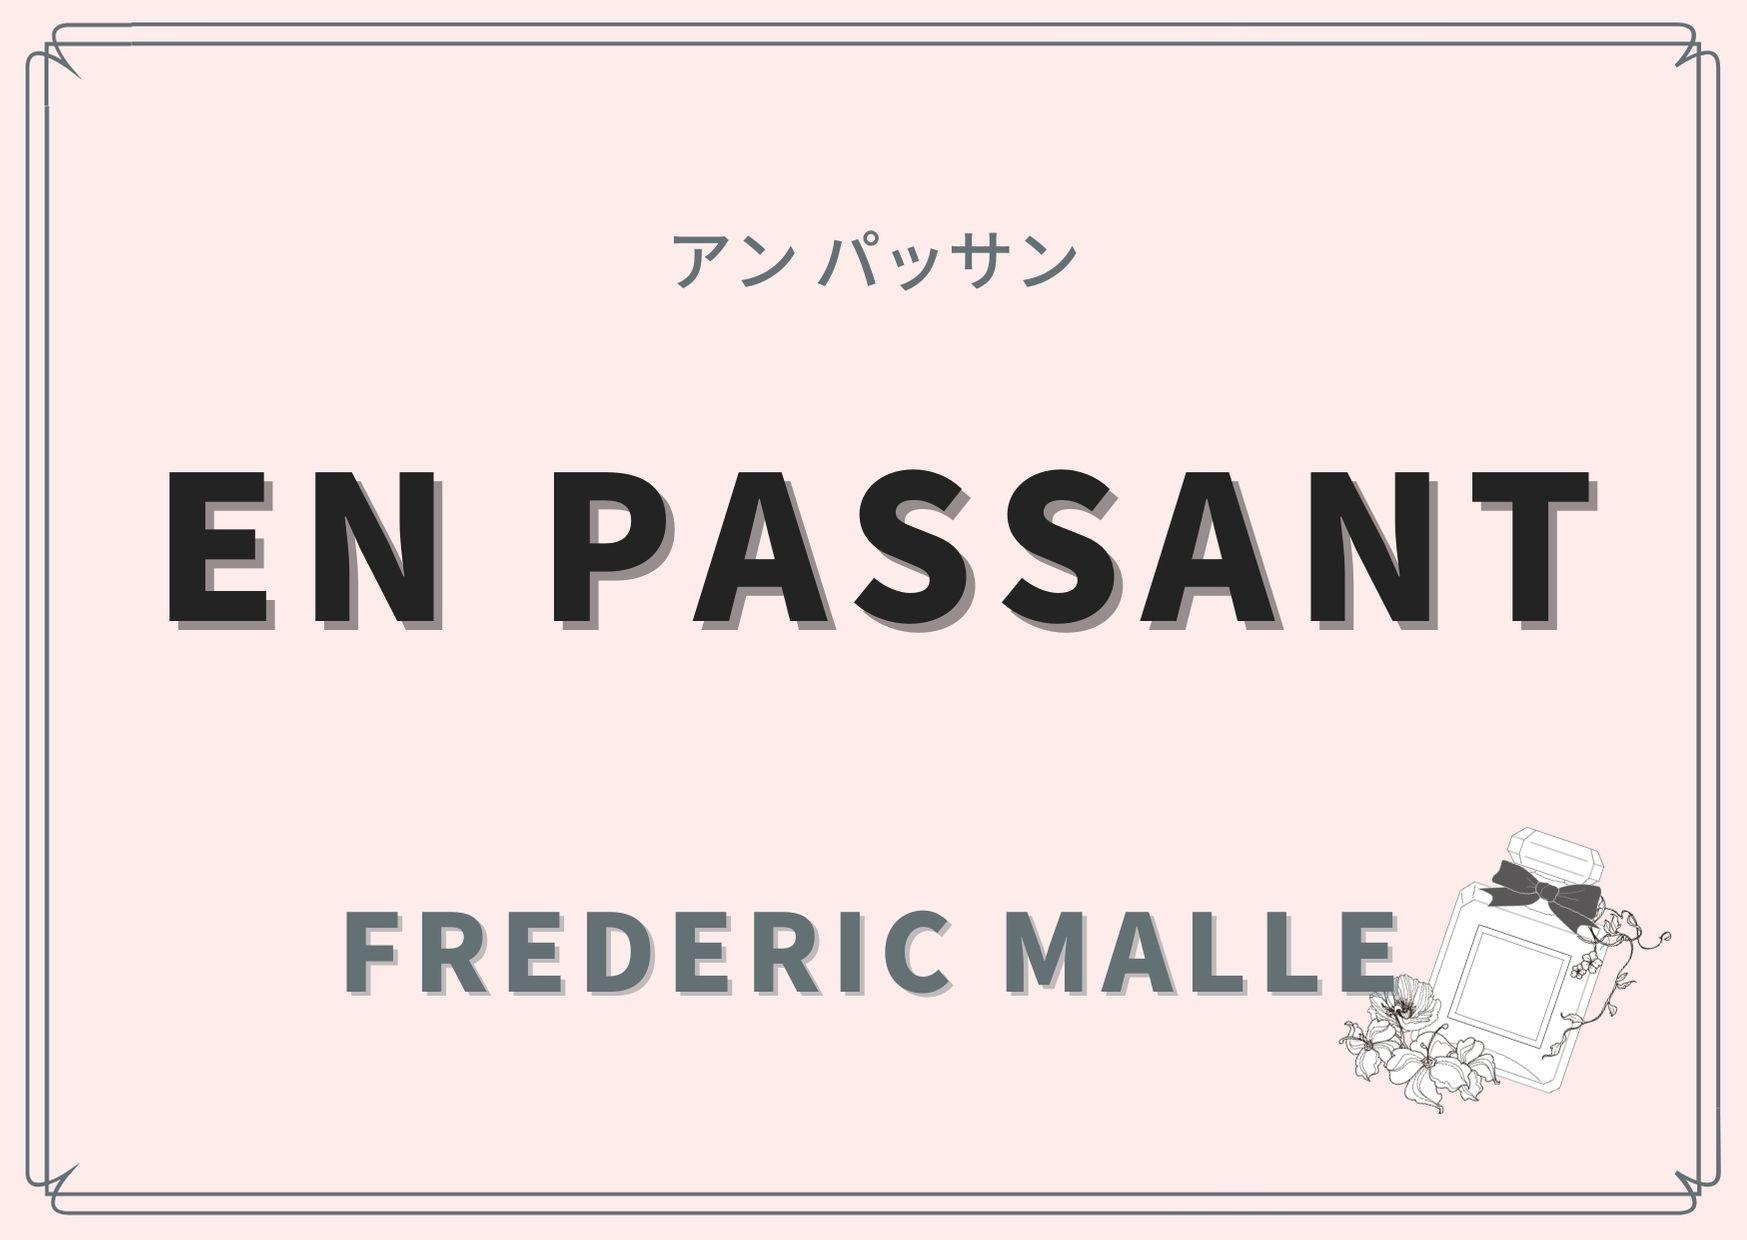 EN PASSANT(アン パッサン)/FREDERIC MALLE(フレデリック マル)